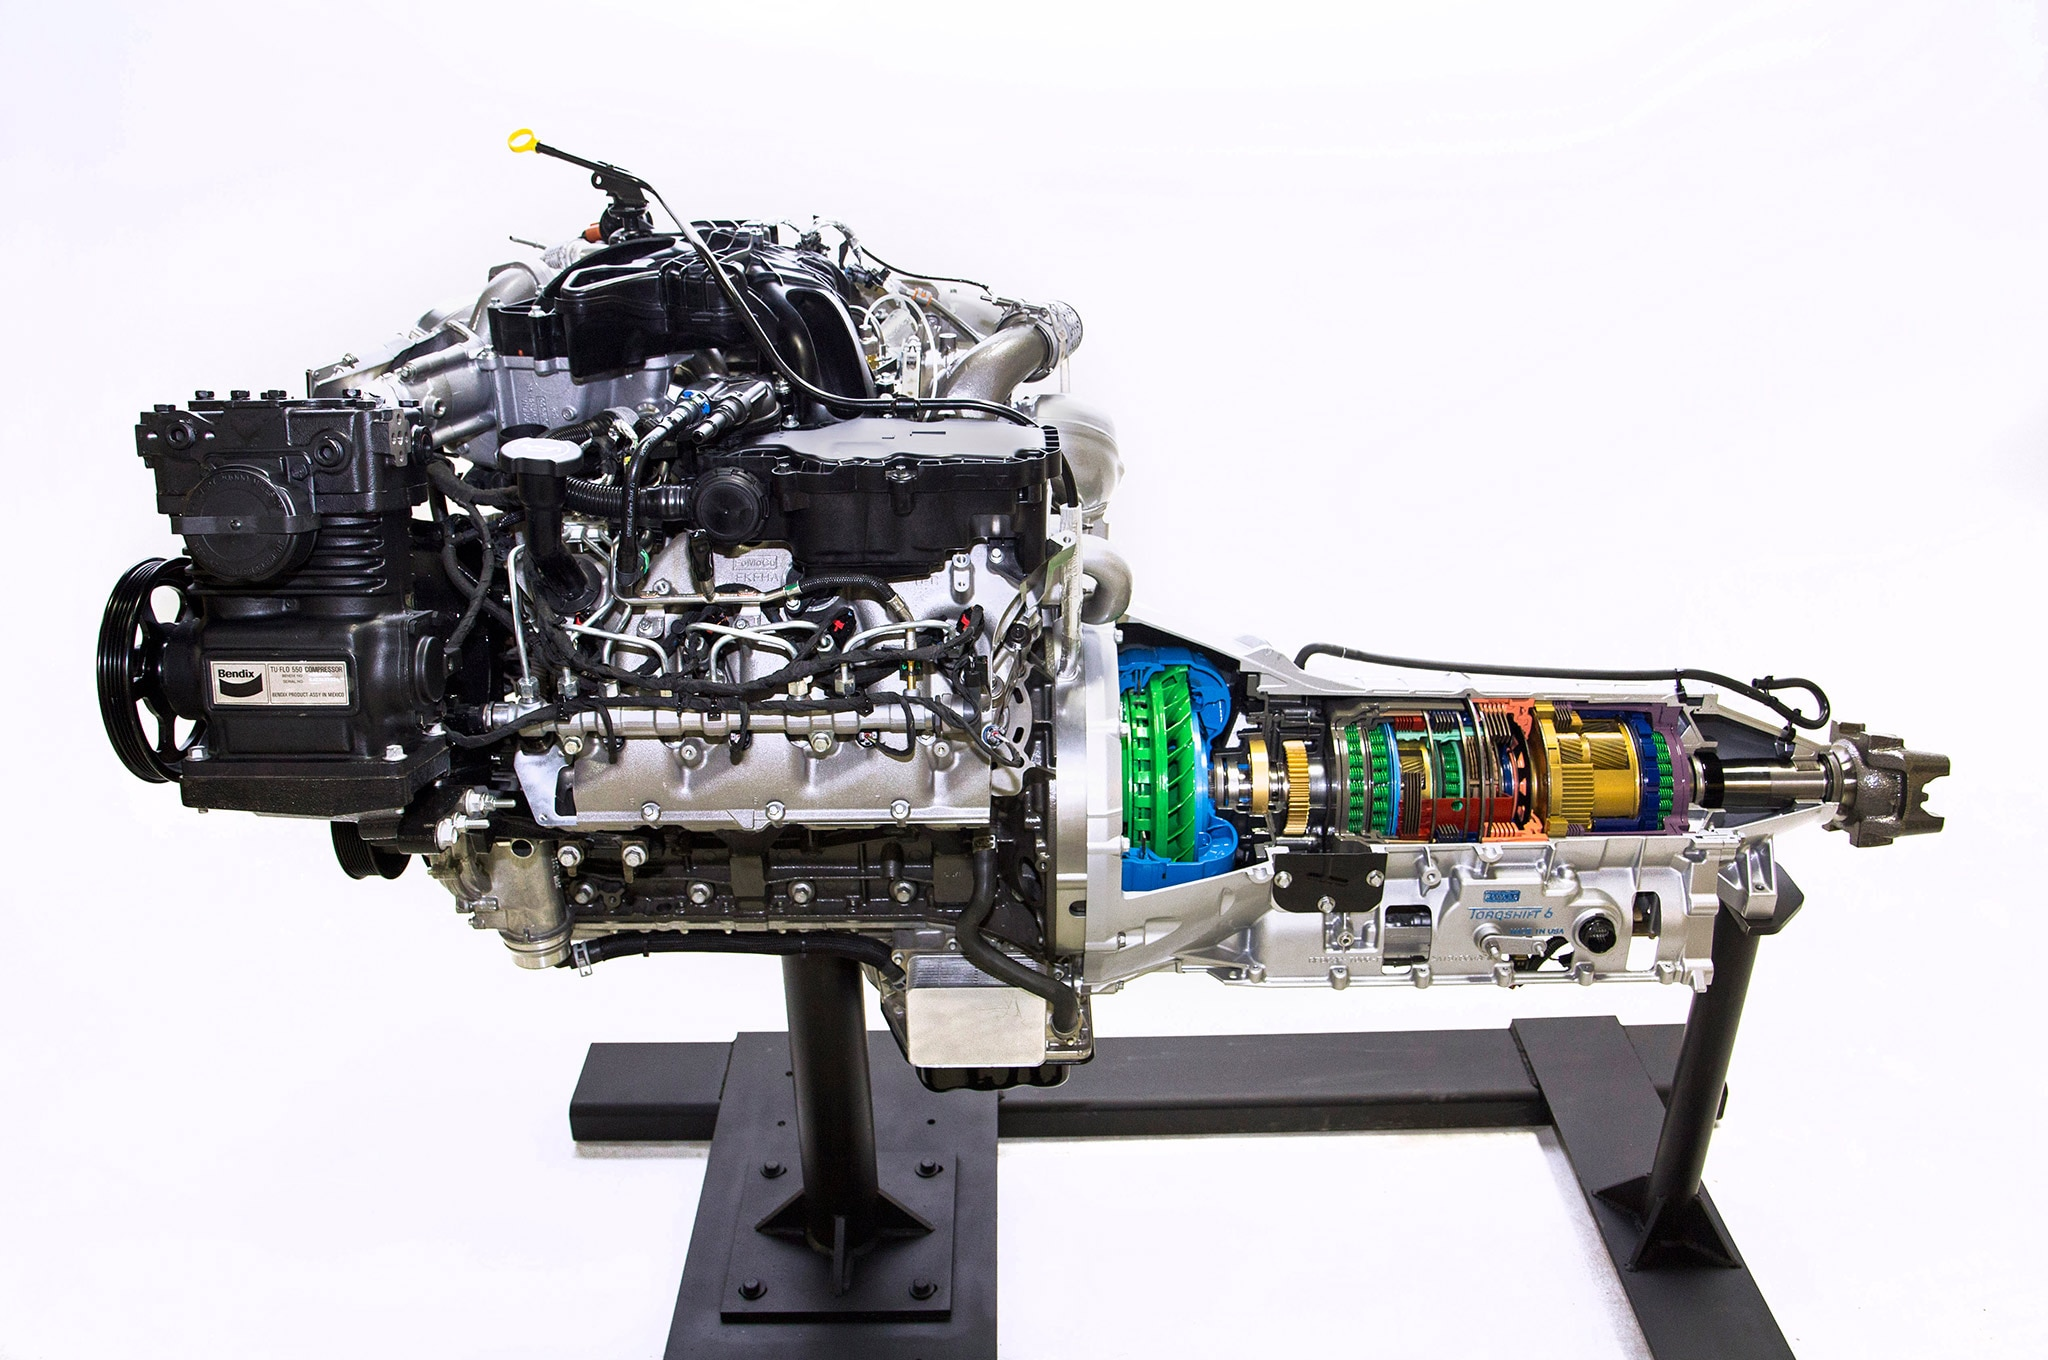 005 Ford F 750 Tonka Engine Transmission